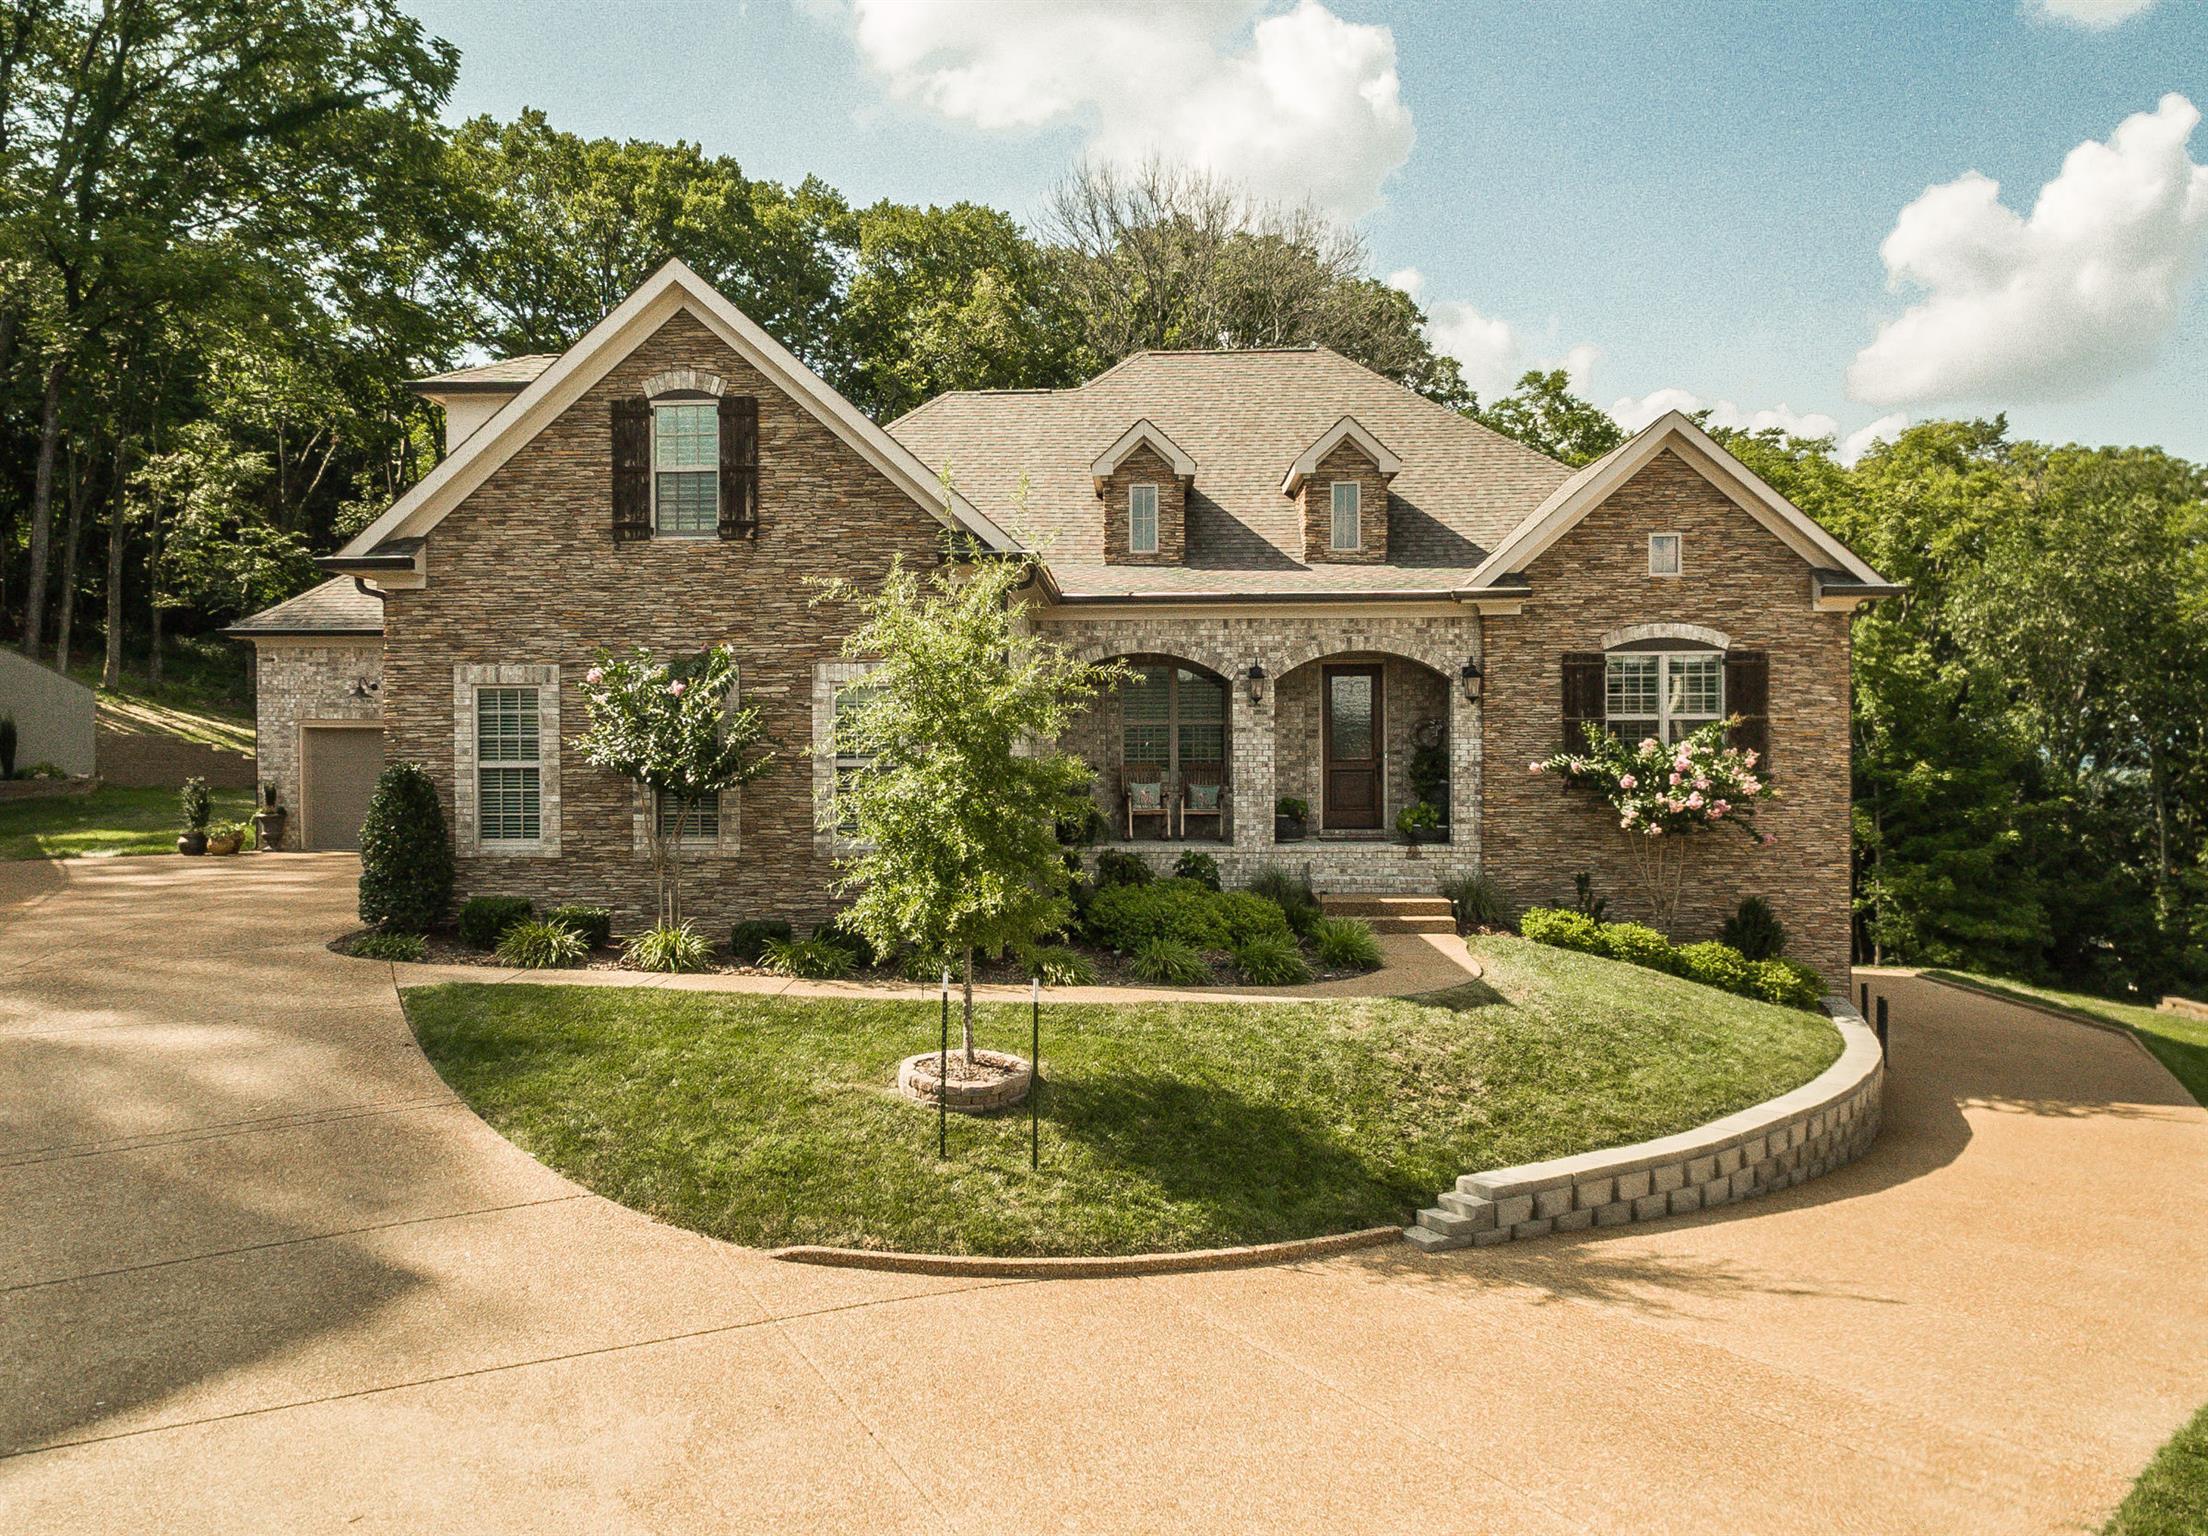 325 Holcombe Ln, Franklin, TN 37064 - Franklin, TN real estate listing